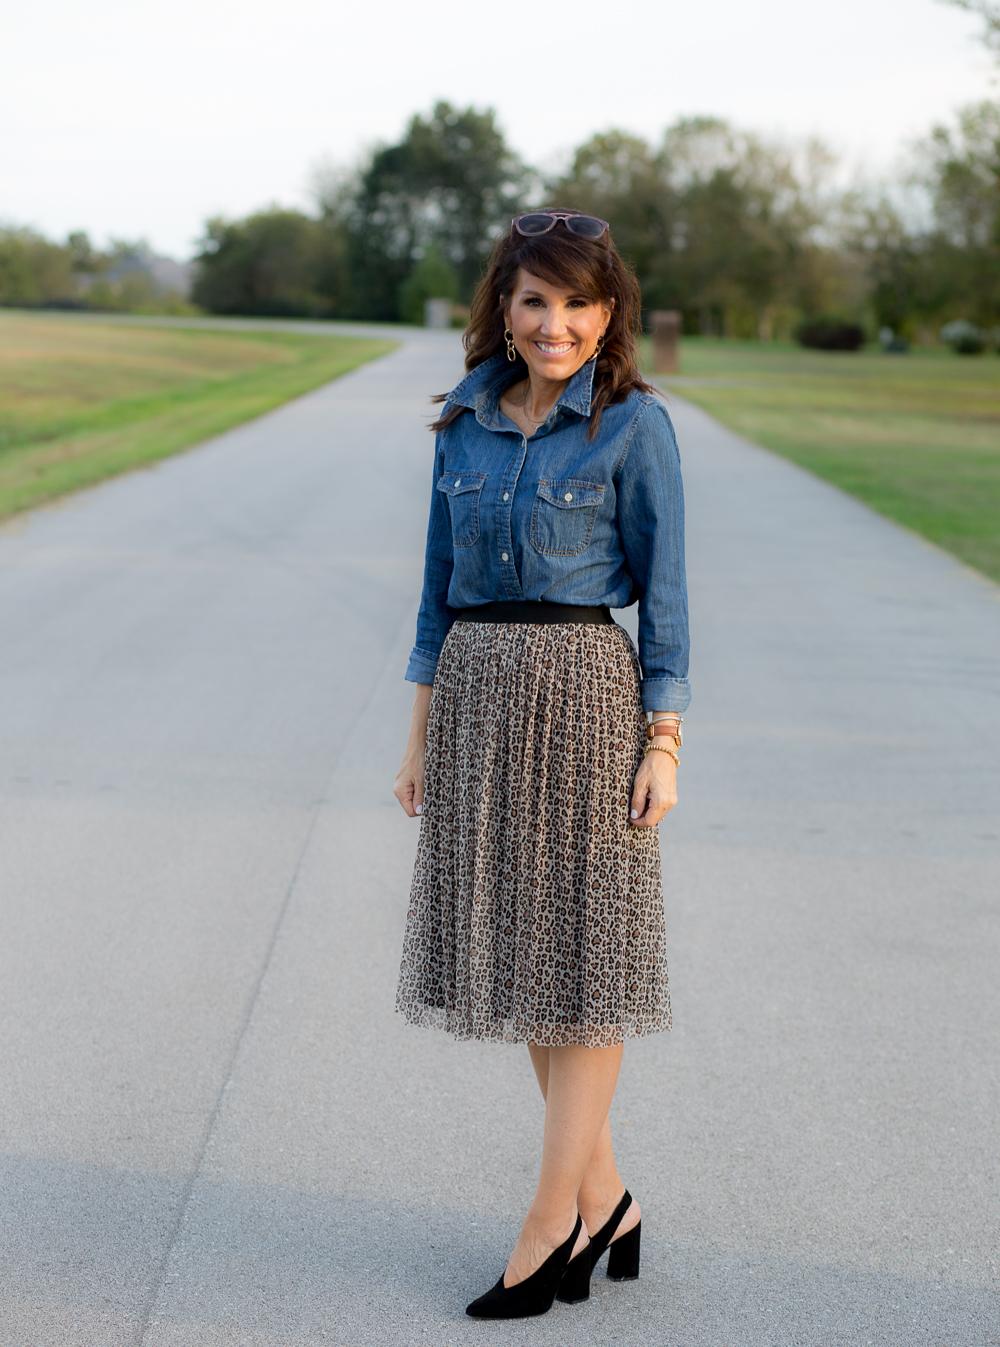 3 Ways To Dress Up A Denim Shirt